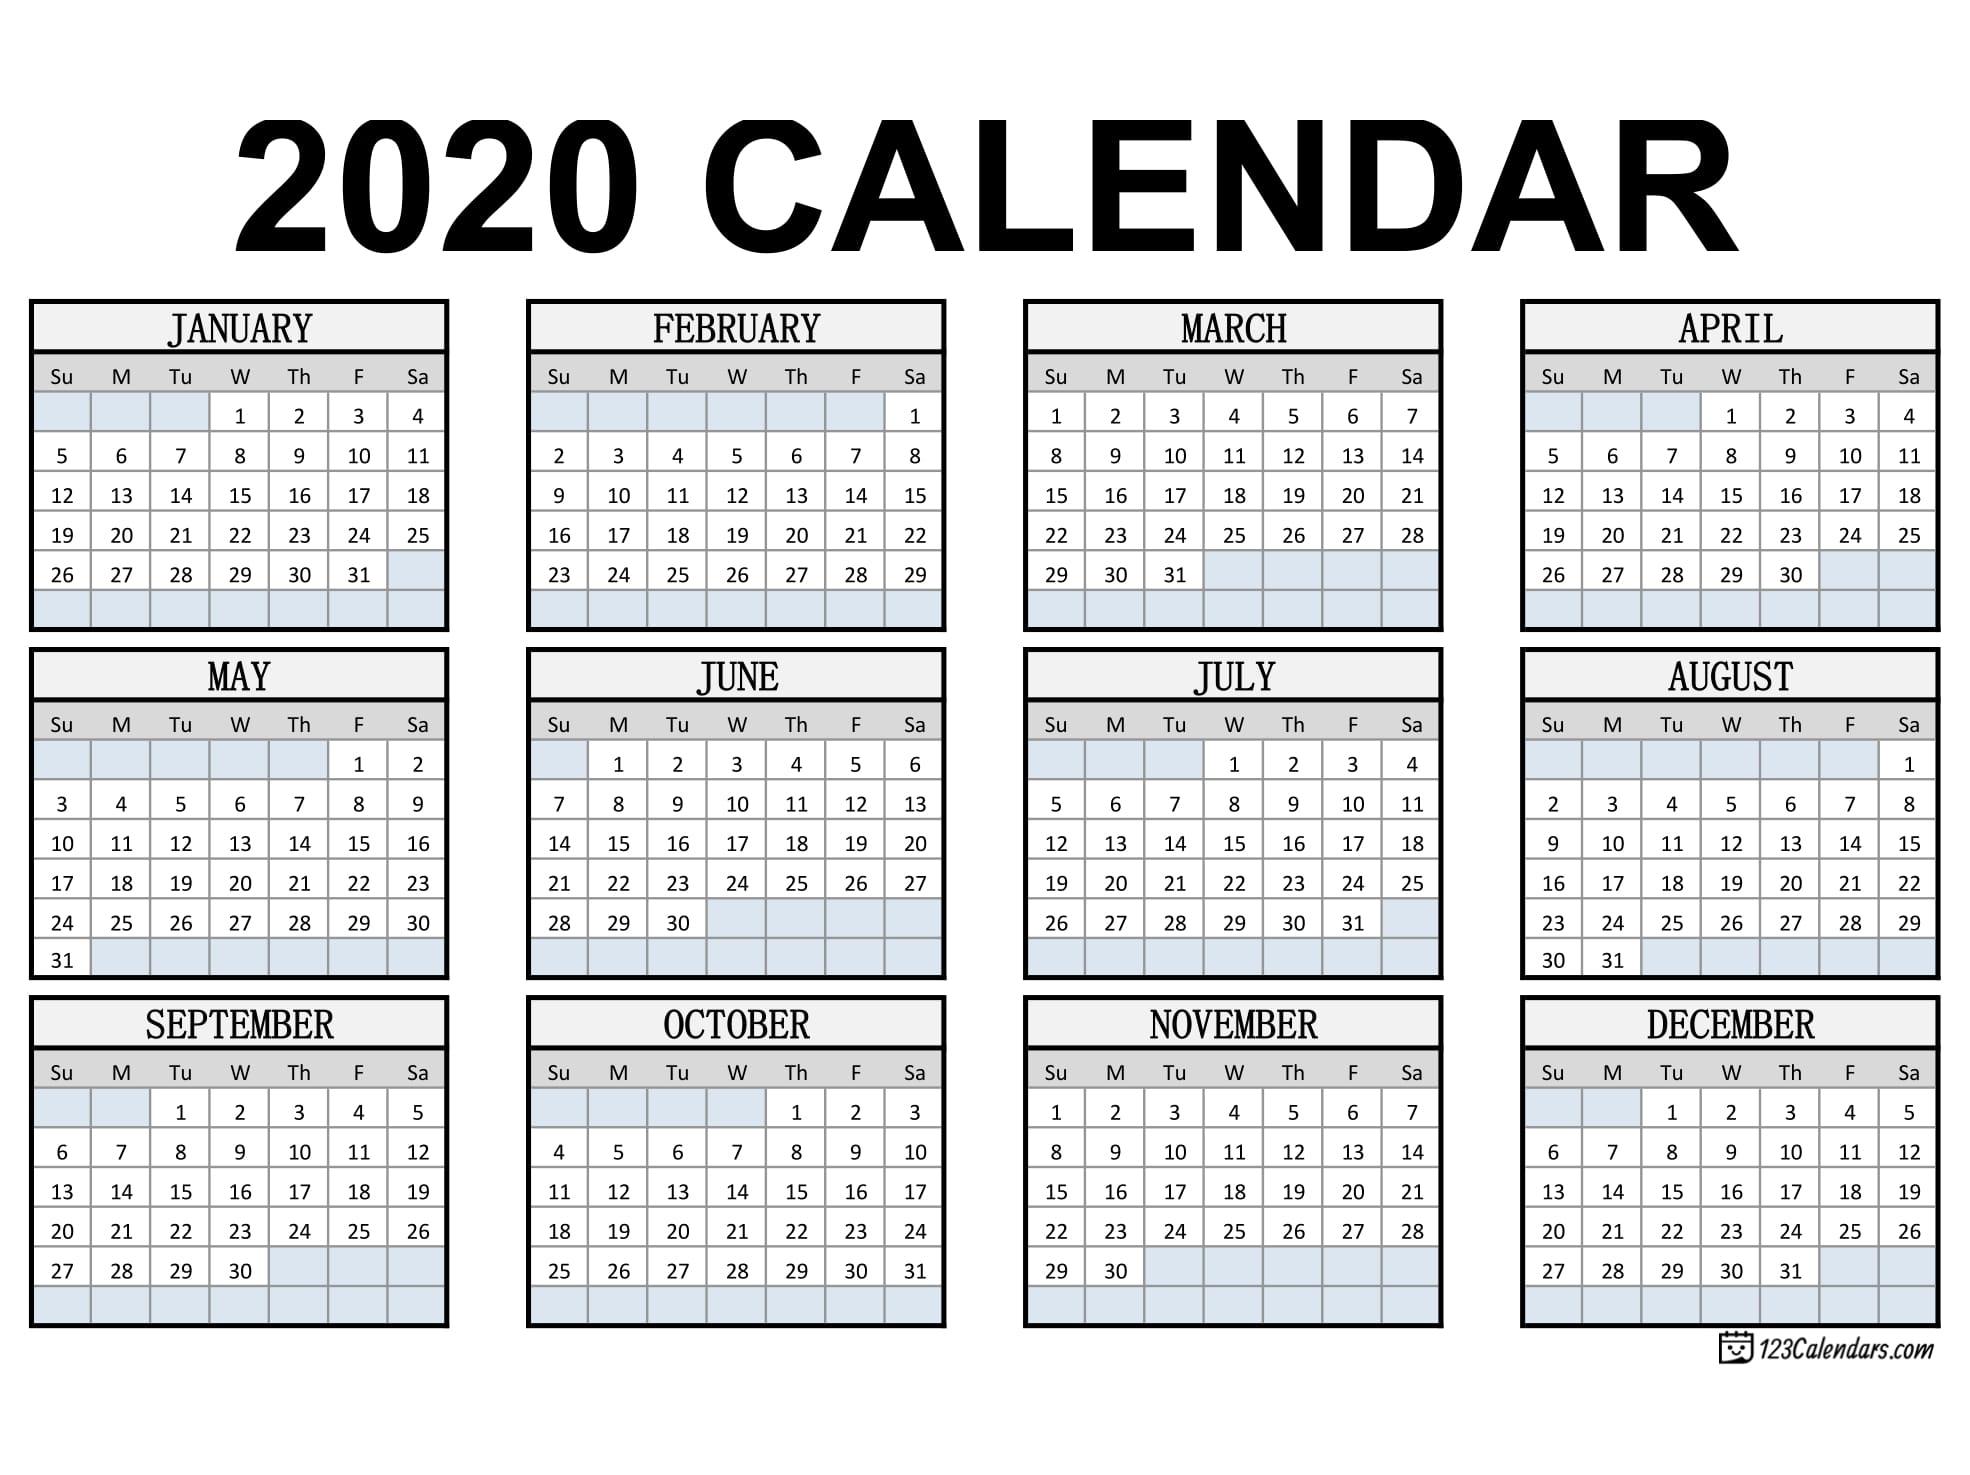 Free Printable 2020 Calendar | 123Calendars throughout Pocket Size Calendar Free Printable